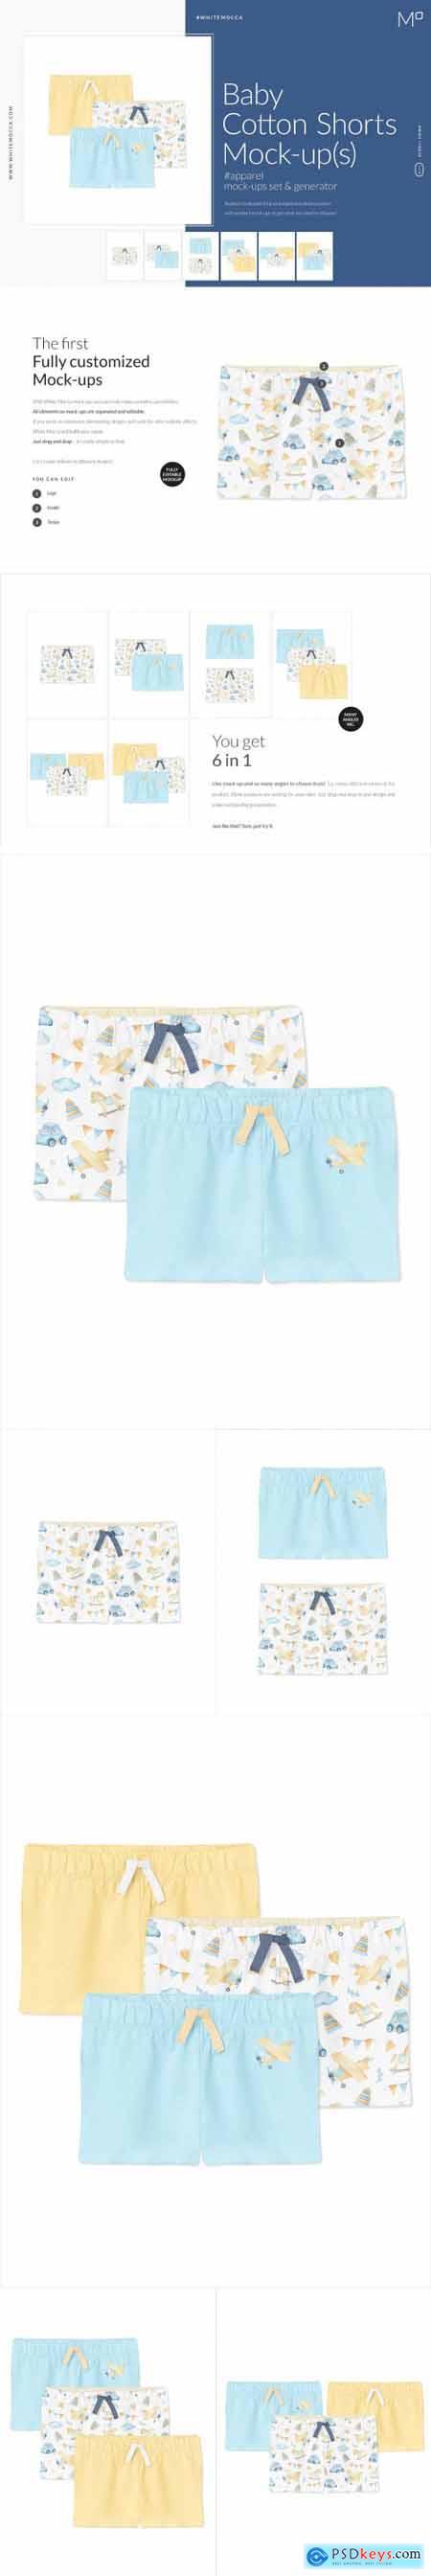 Baby Cotton Shorts Mock-ups Set 4662071